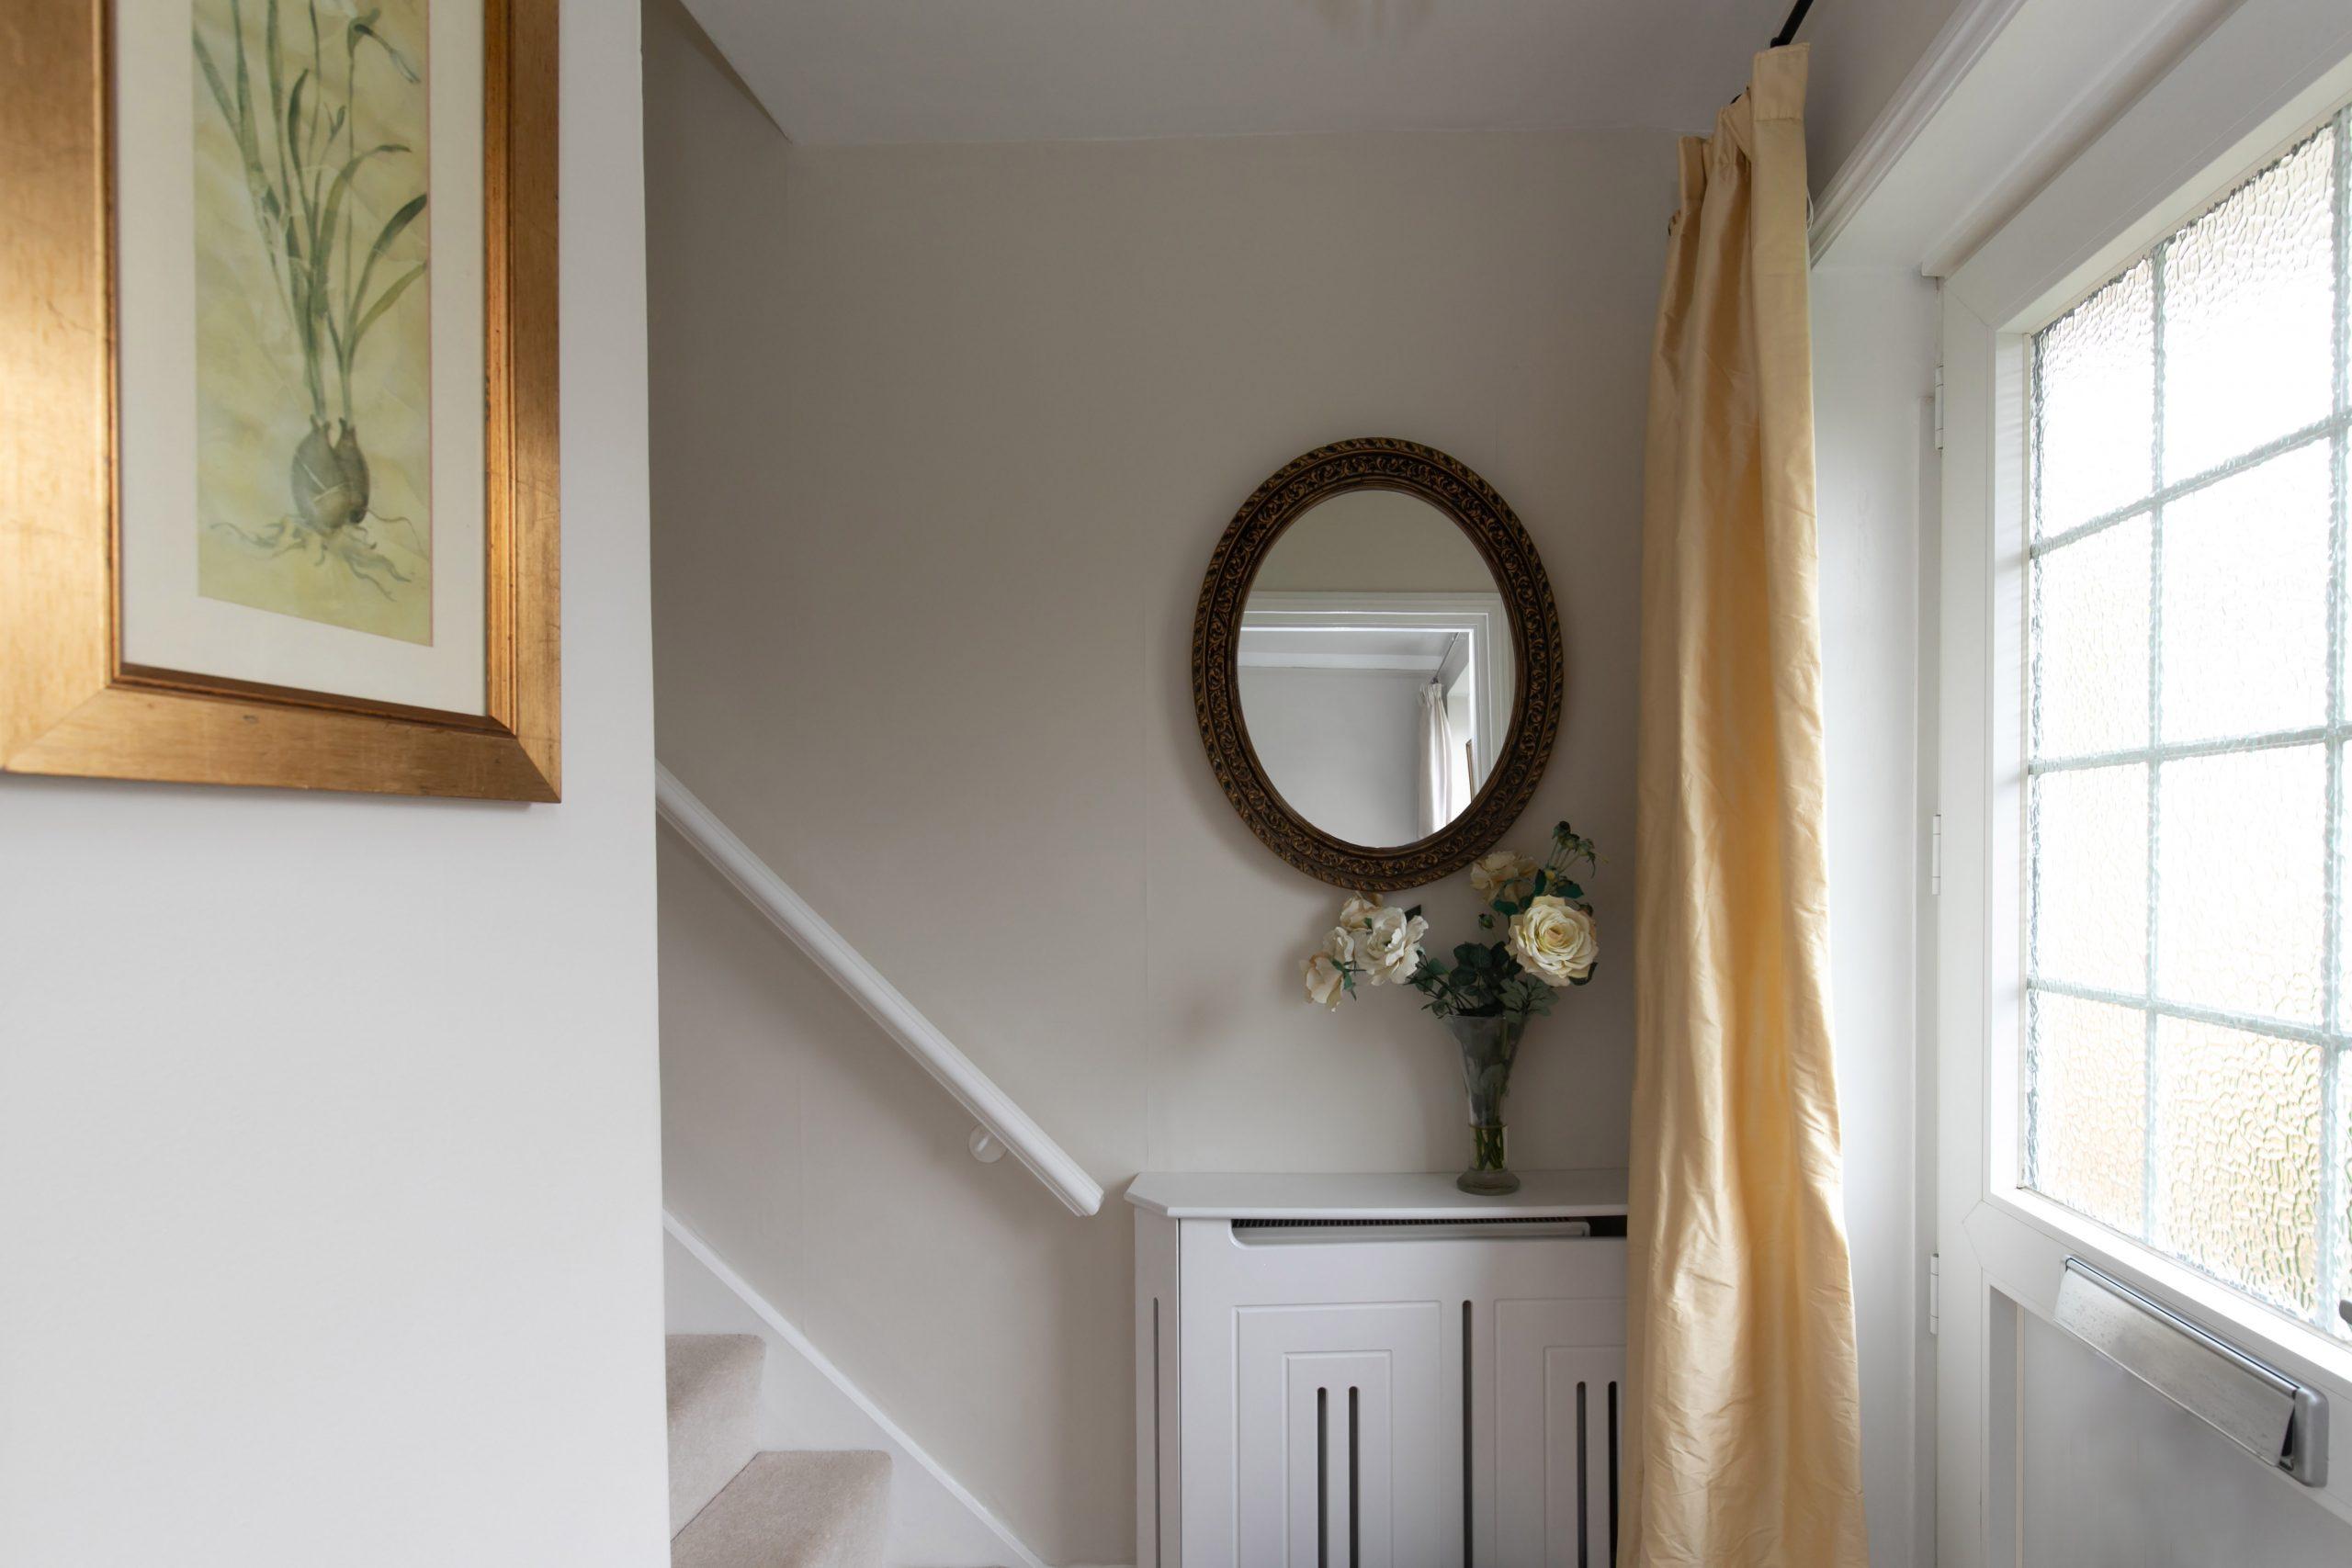 Winchelsea – Two Bedroom End of Terrace House